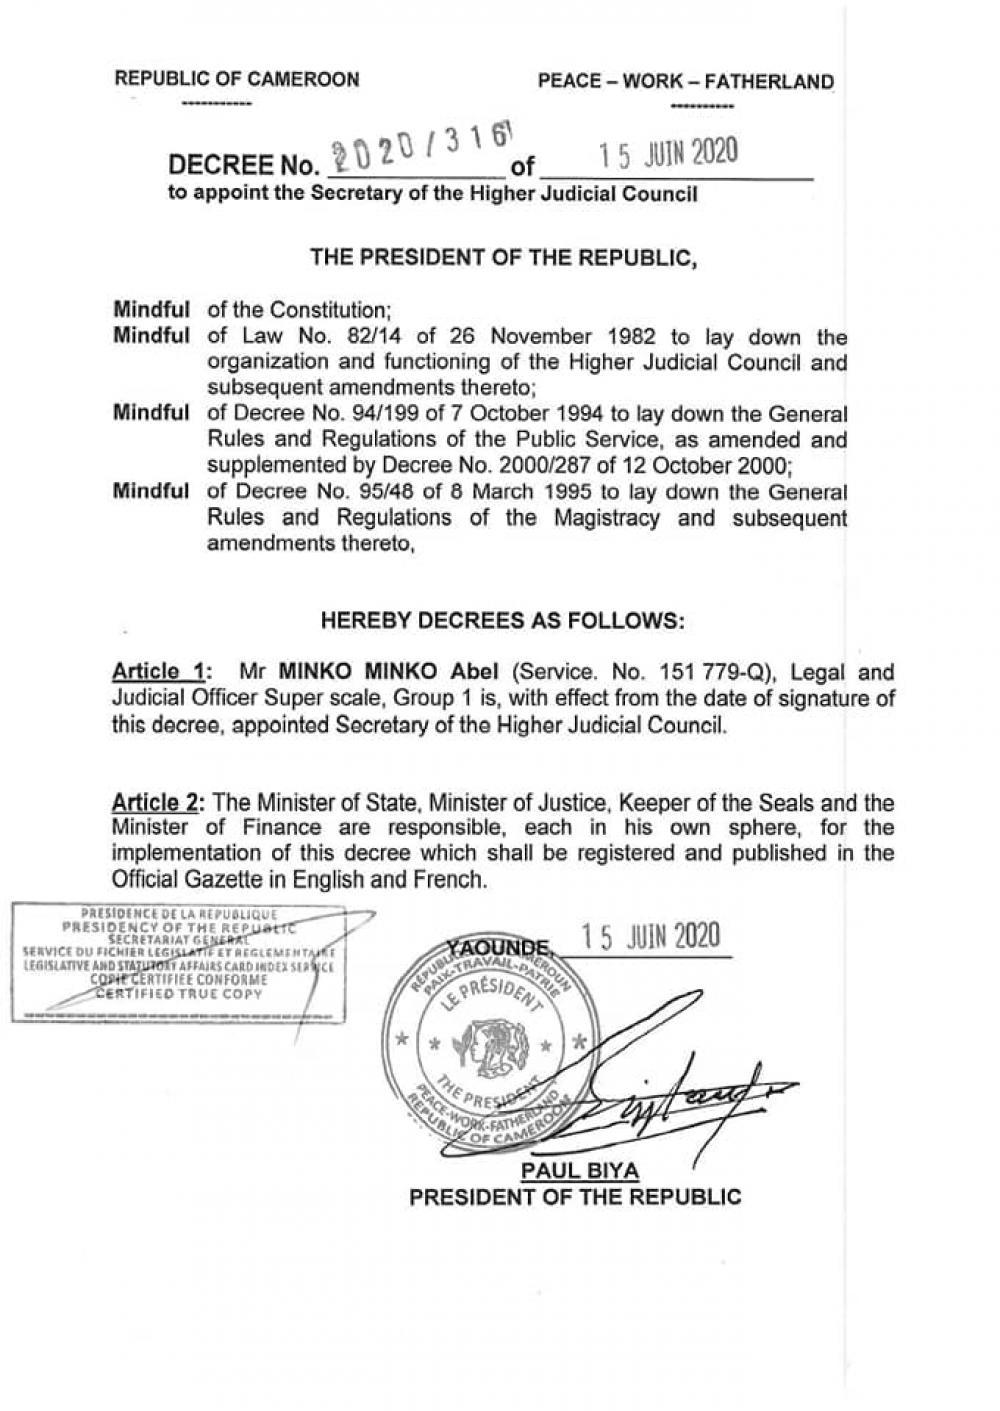 Abel Minko Minko appointment